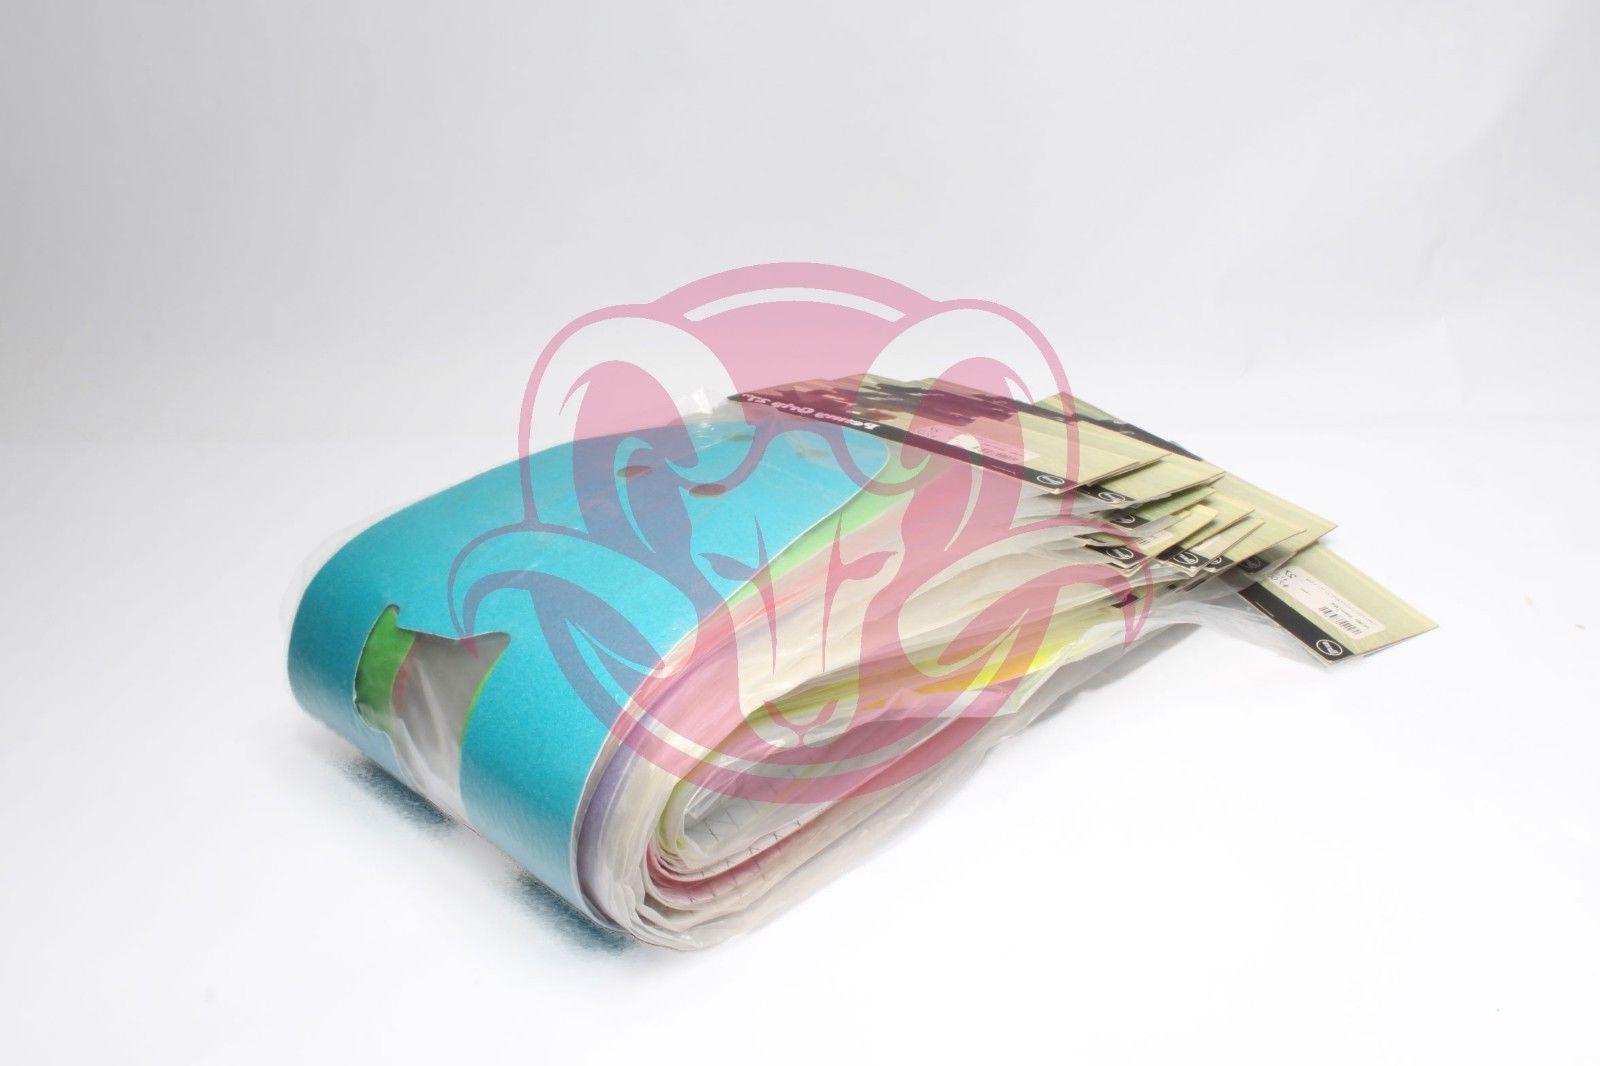 skateboard 22 grip tape